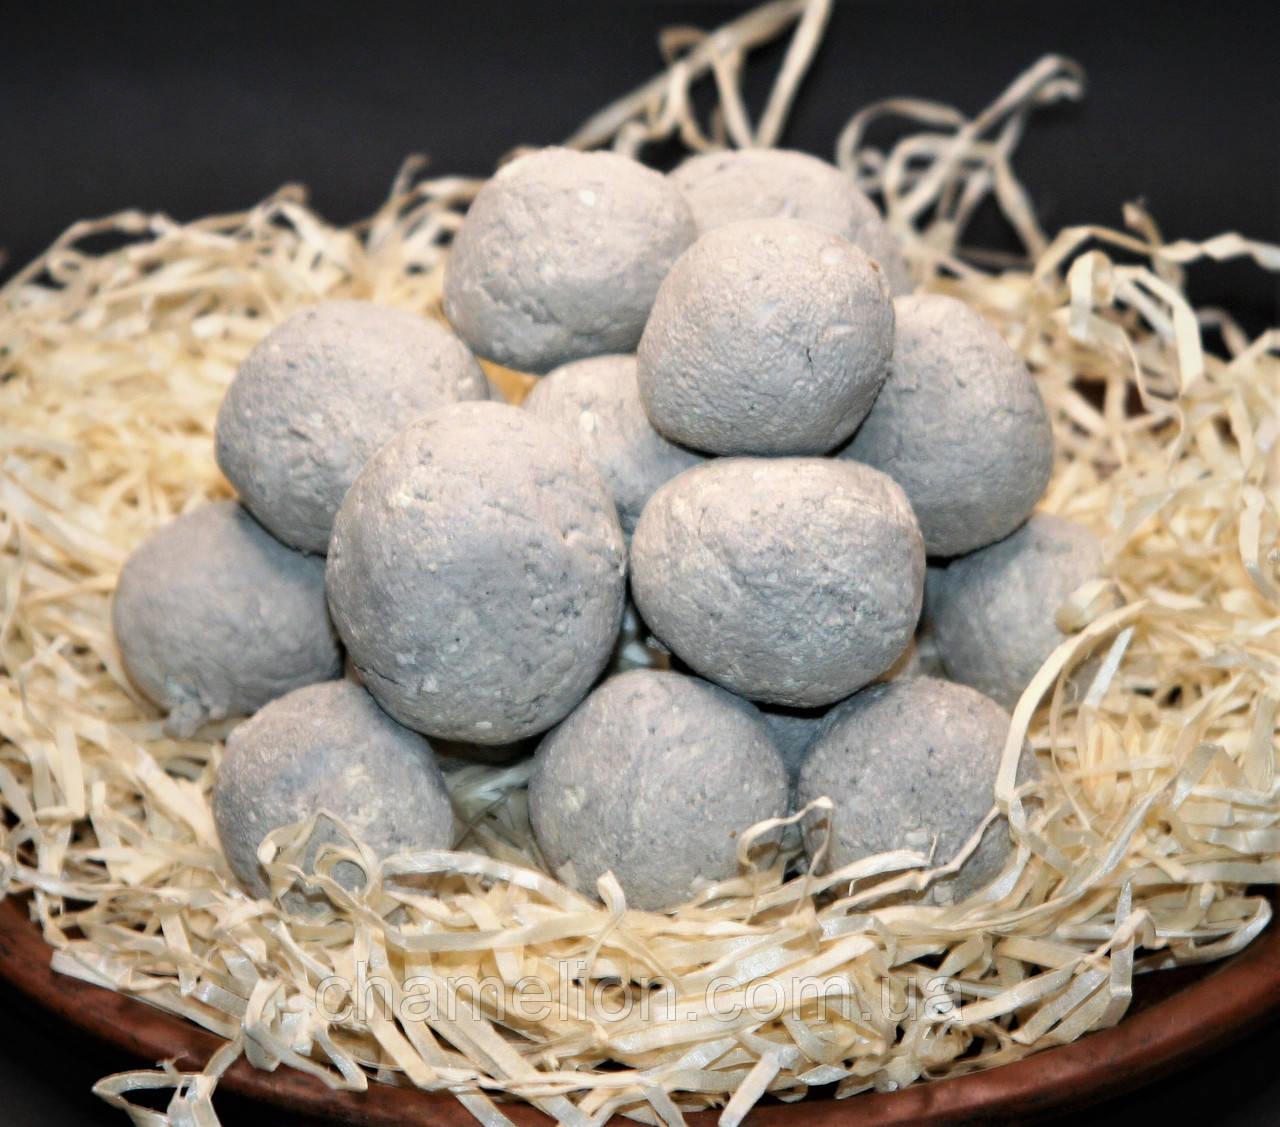 Кульки з білої глини і блакитної глини 500 грам (Шарики из белой глины и голубой глины 500 грамм)